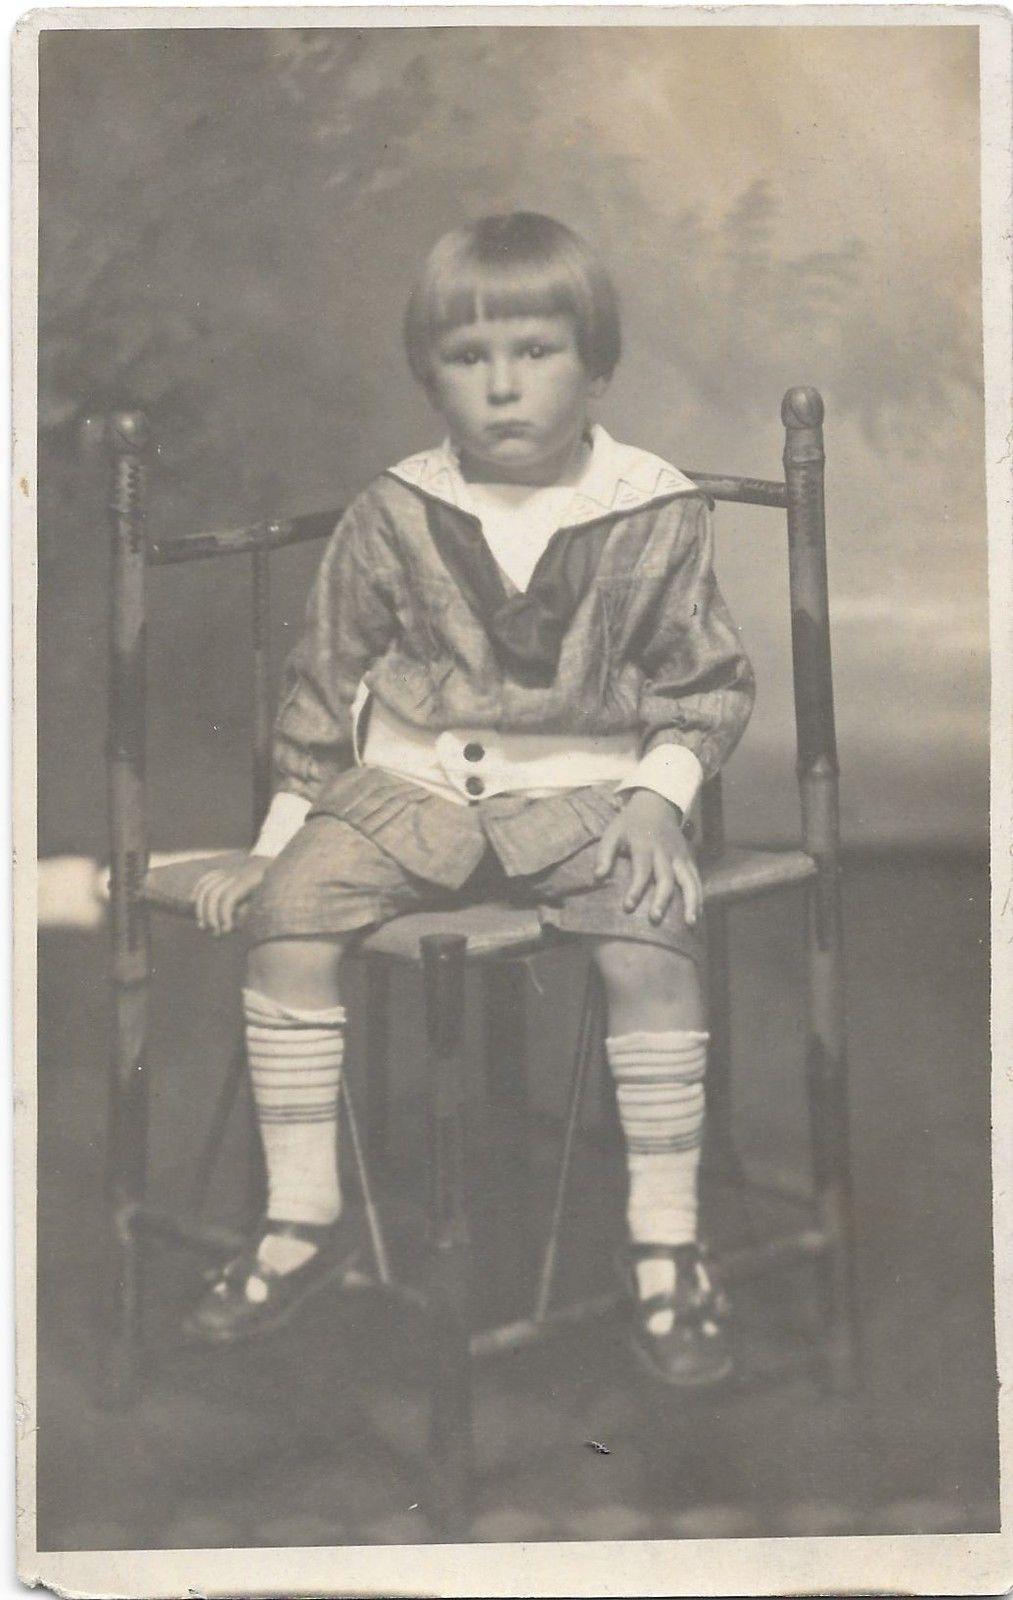 RPPC Little Boy on a Chair - Vintage Real Photo c1911 Postcard | eBay